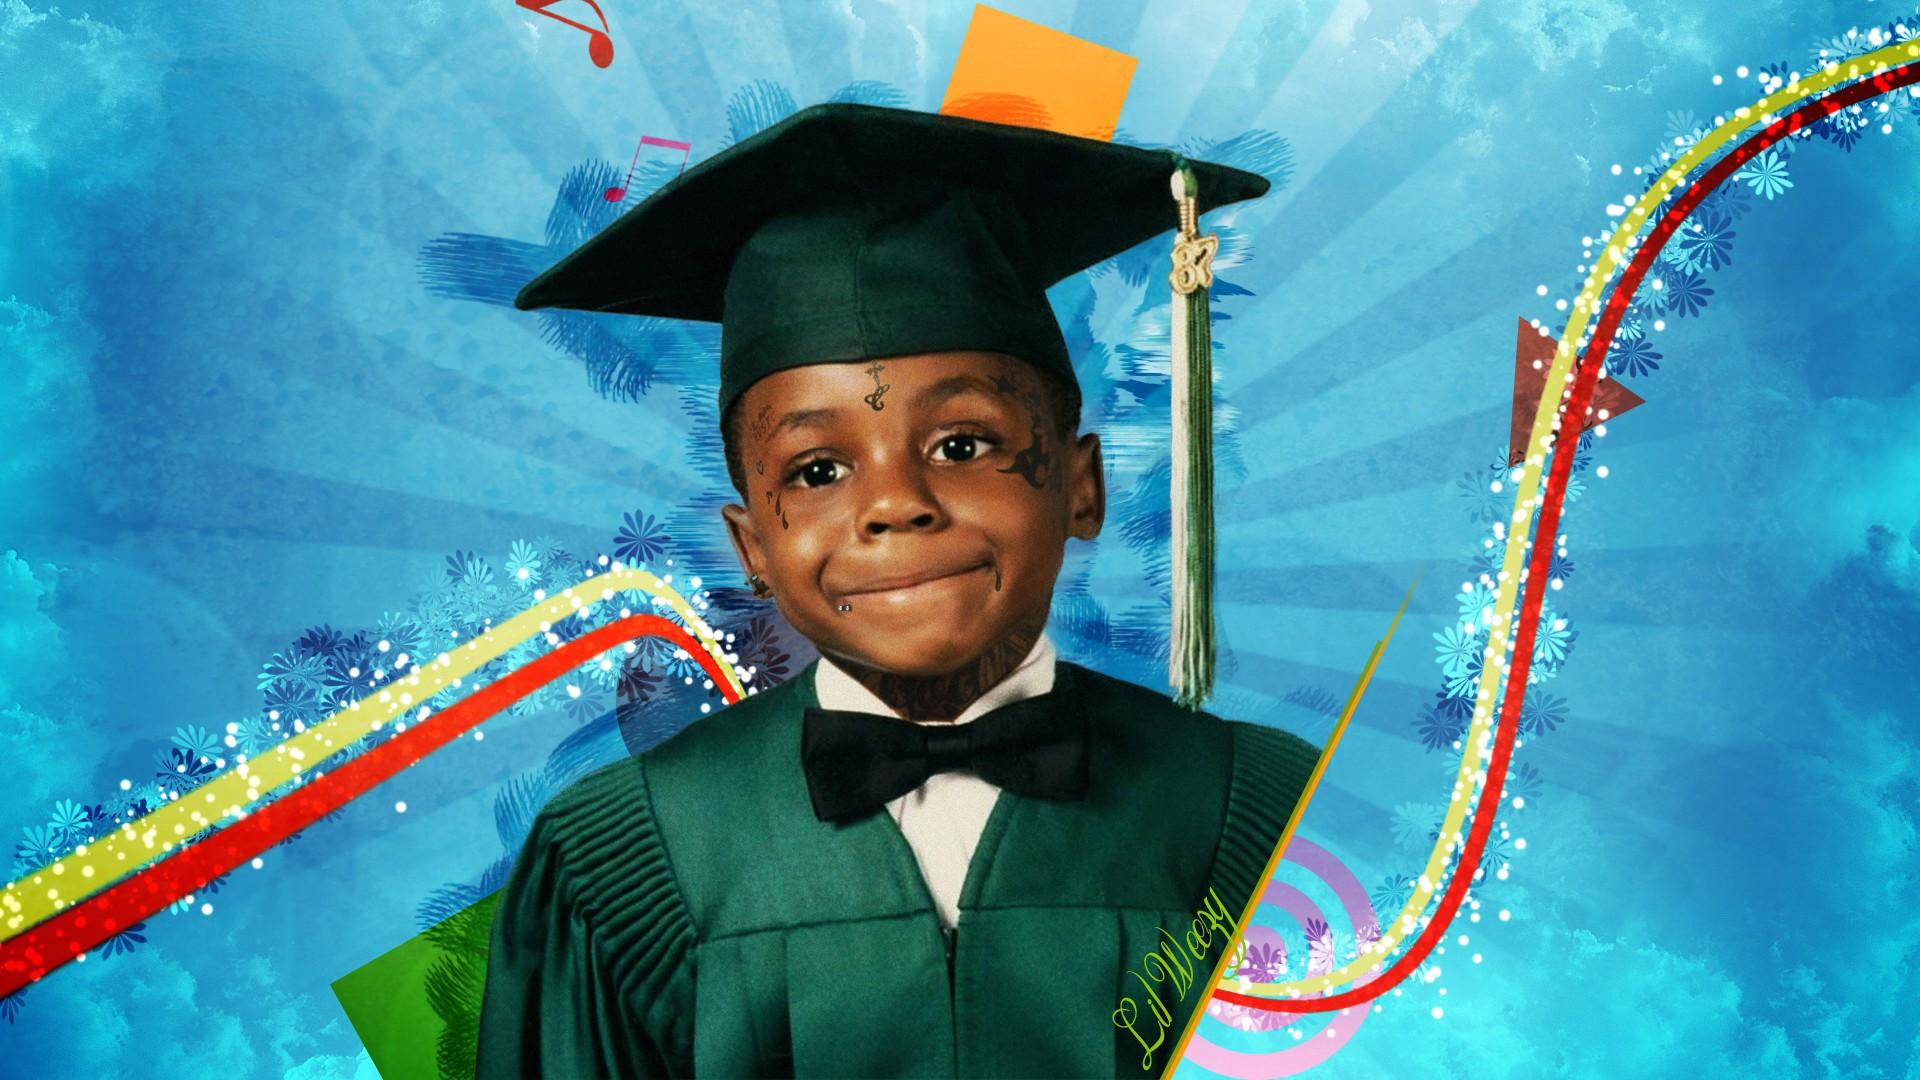 Lil Wayne Images